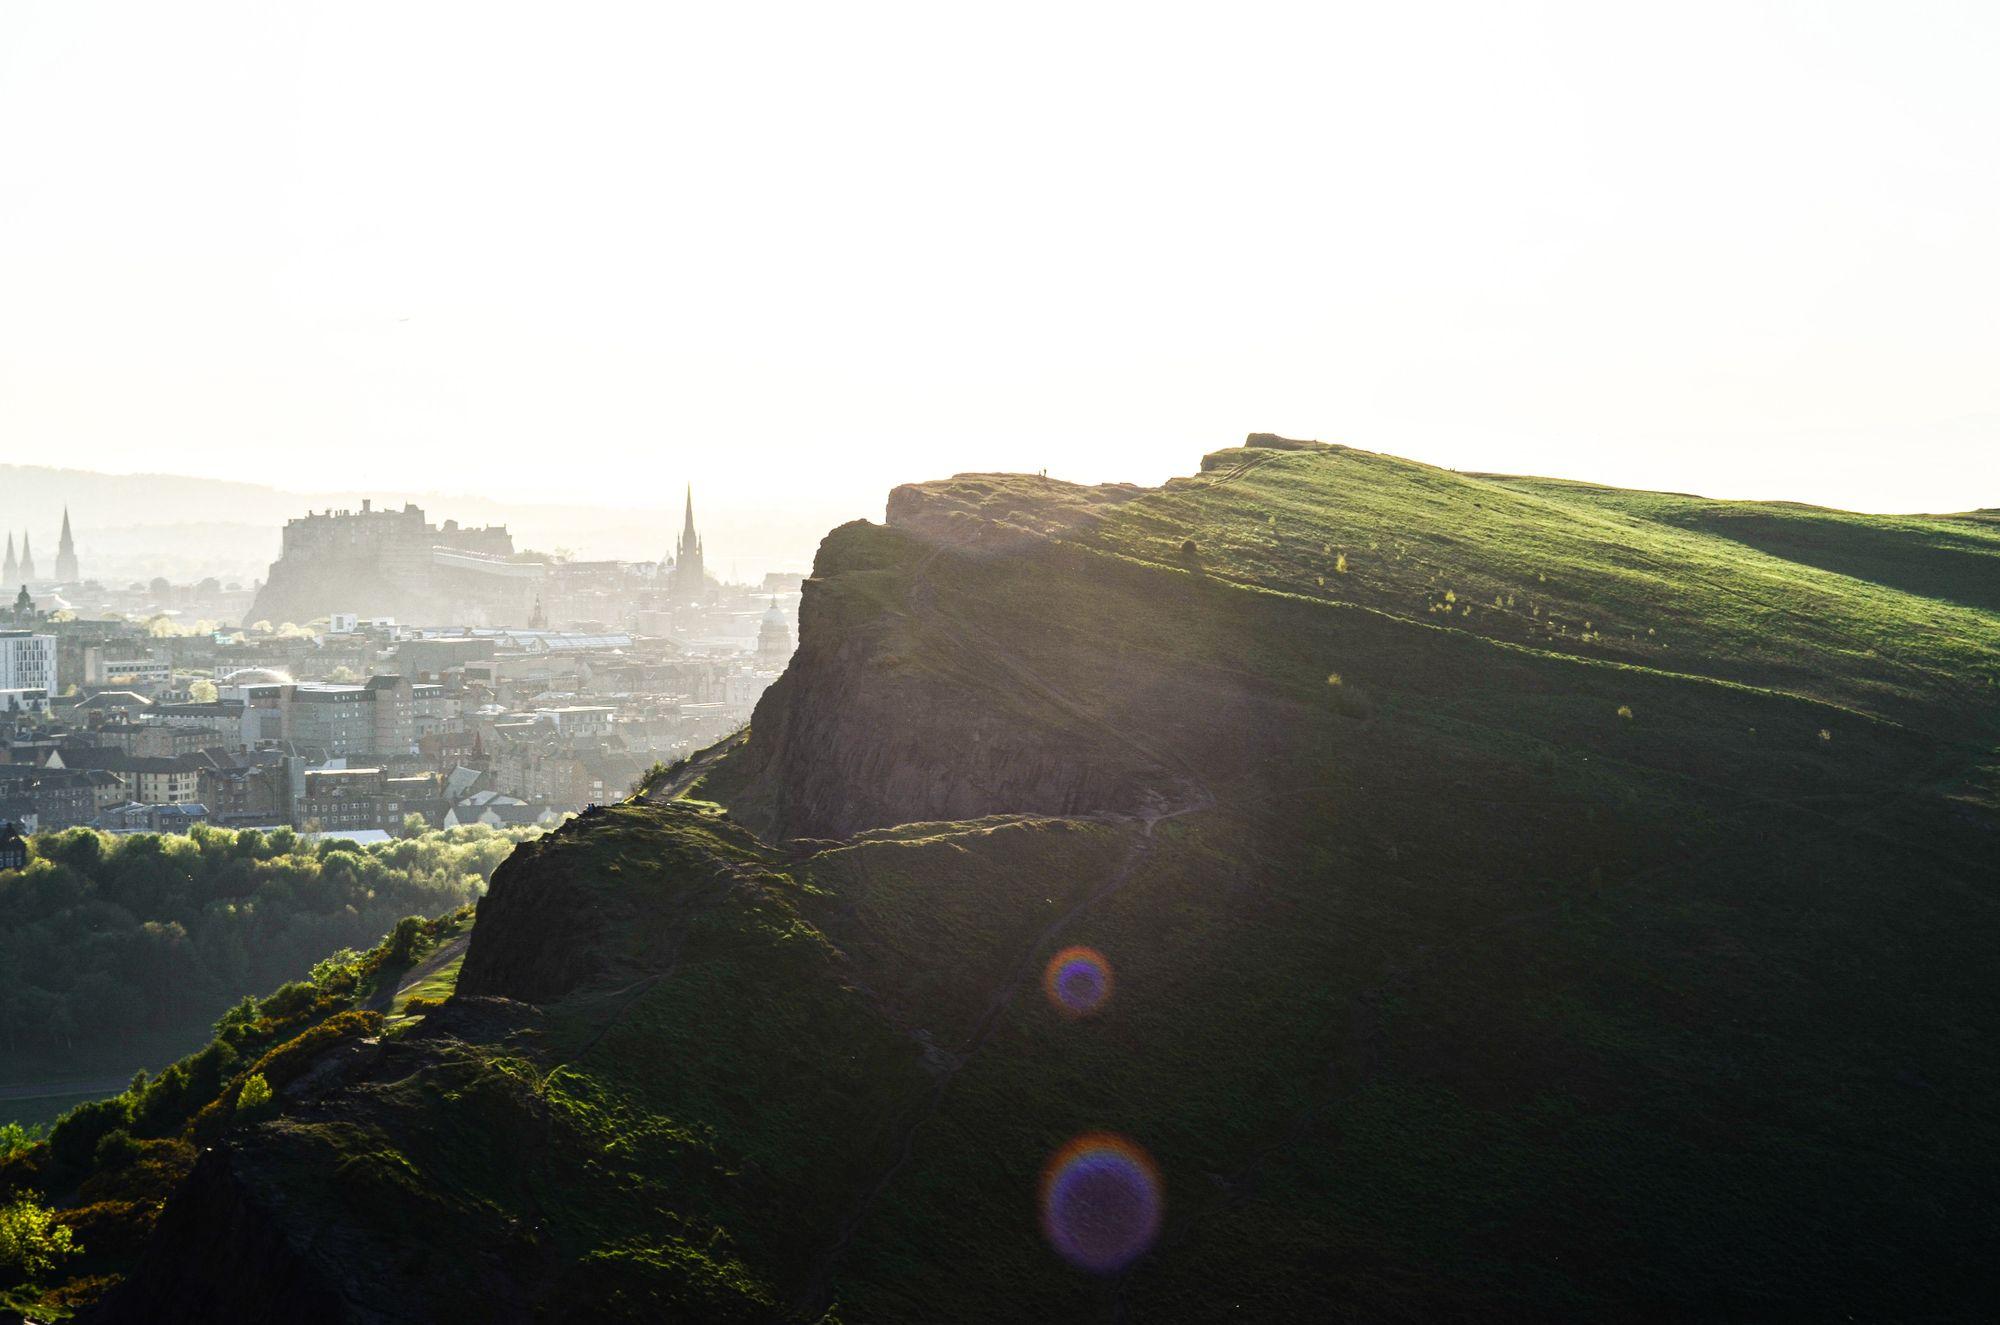 Sun rise over Edinburgh from Arthur's Seat